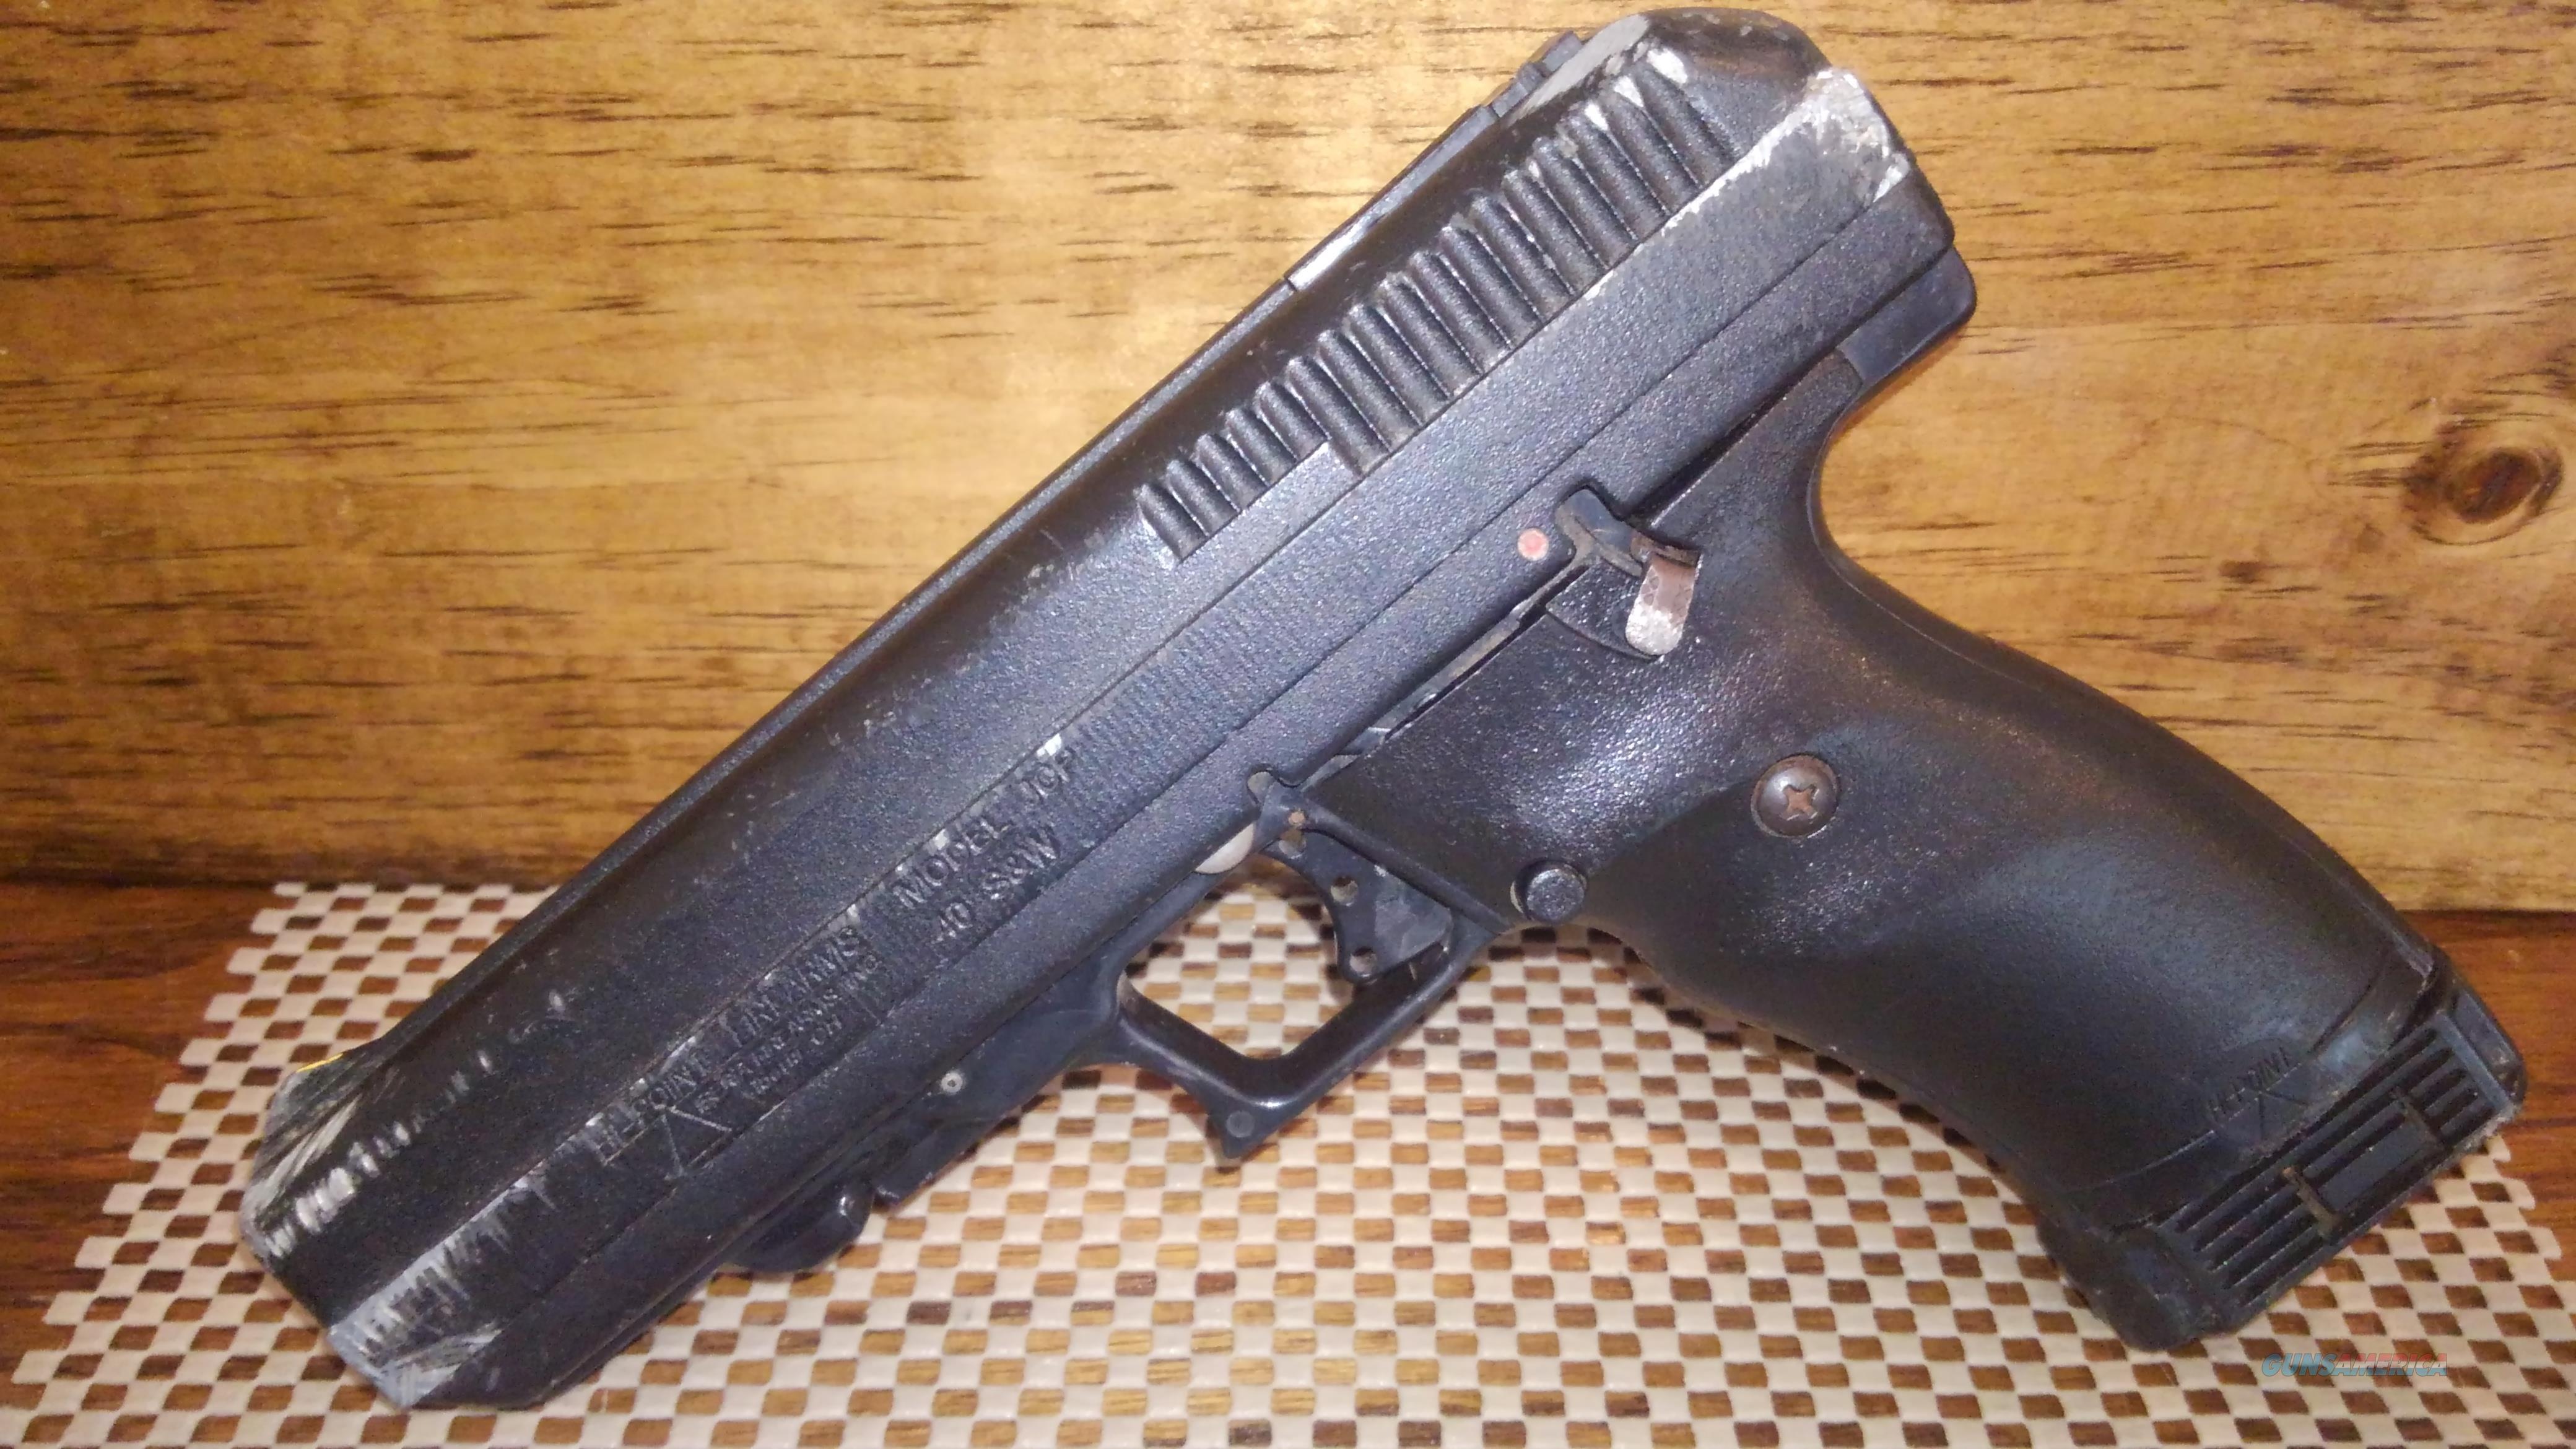 HI POINT JCP 40  1-10RD MAG, FREE SHIPPING NO CC FEE  Guns > Pistols > Hi Point Pistols